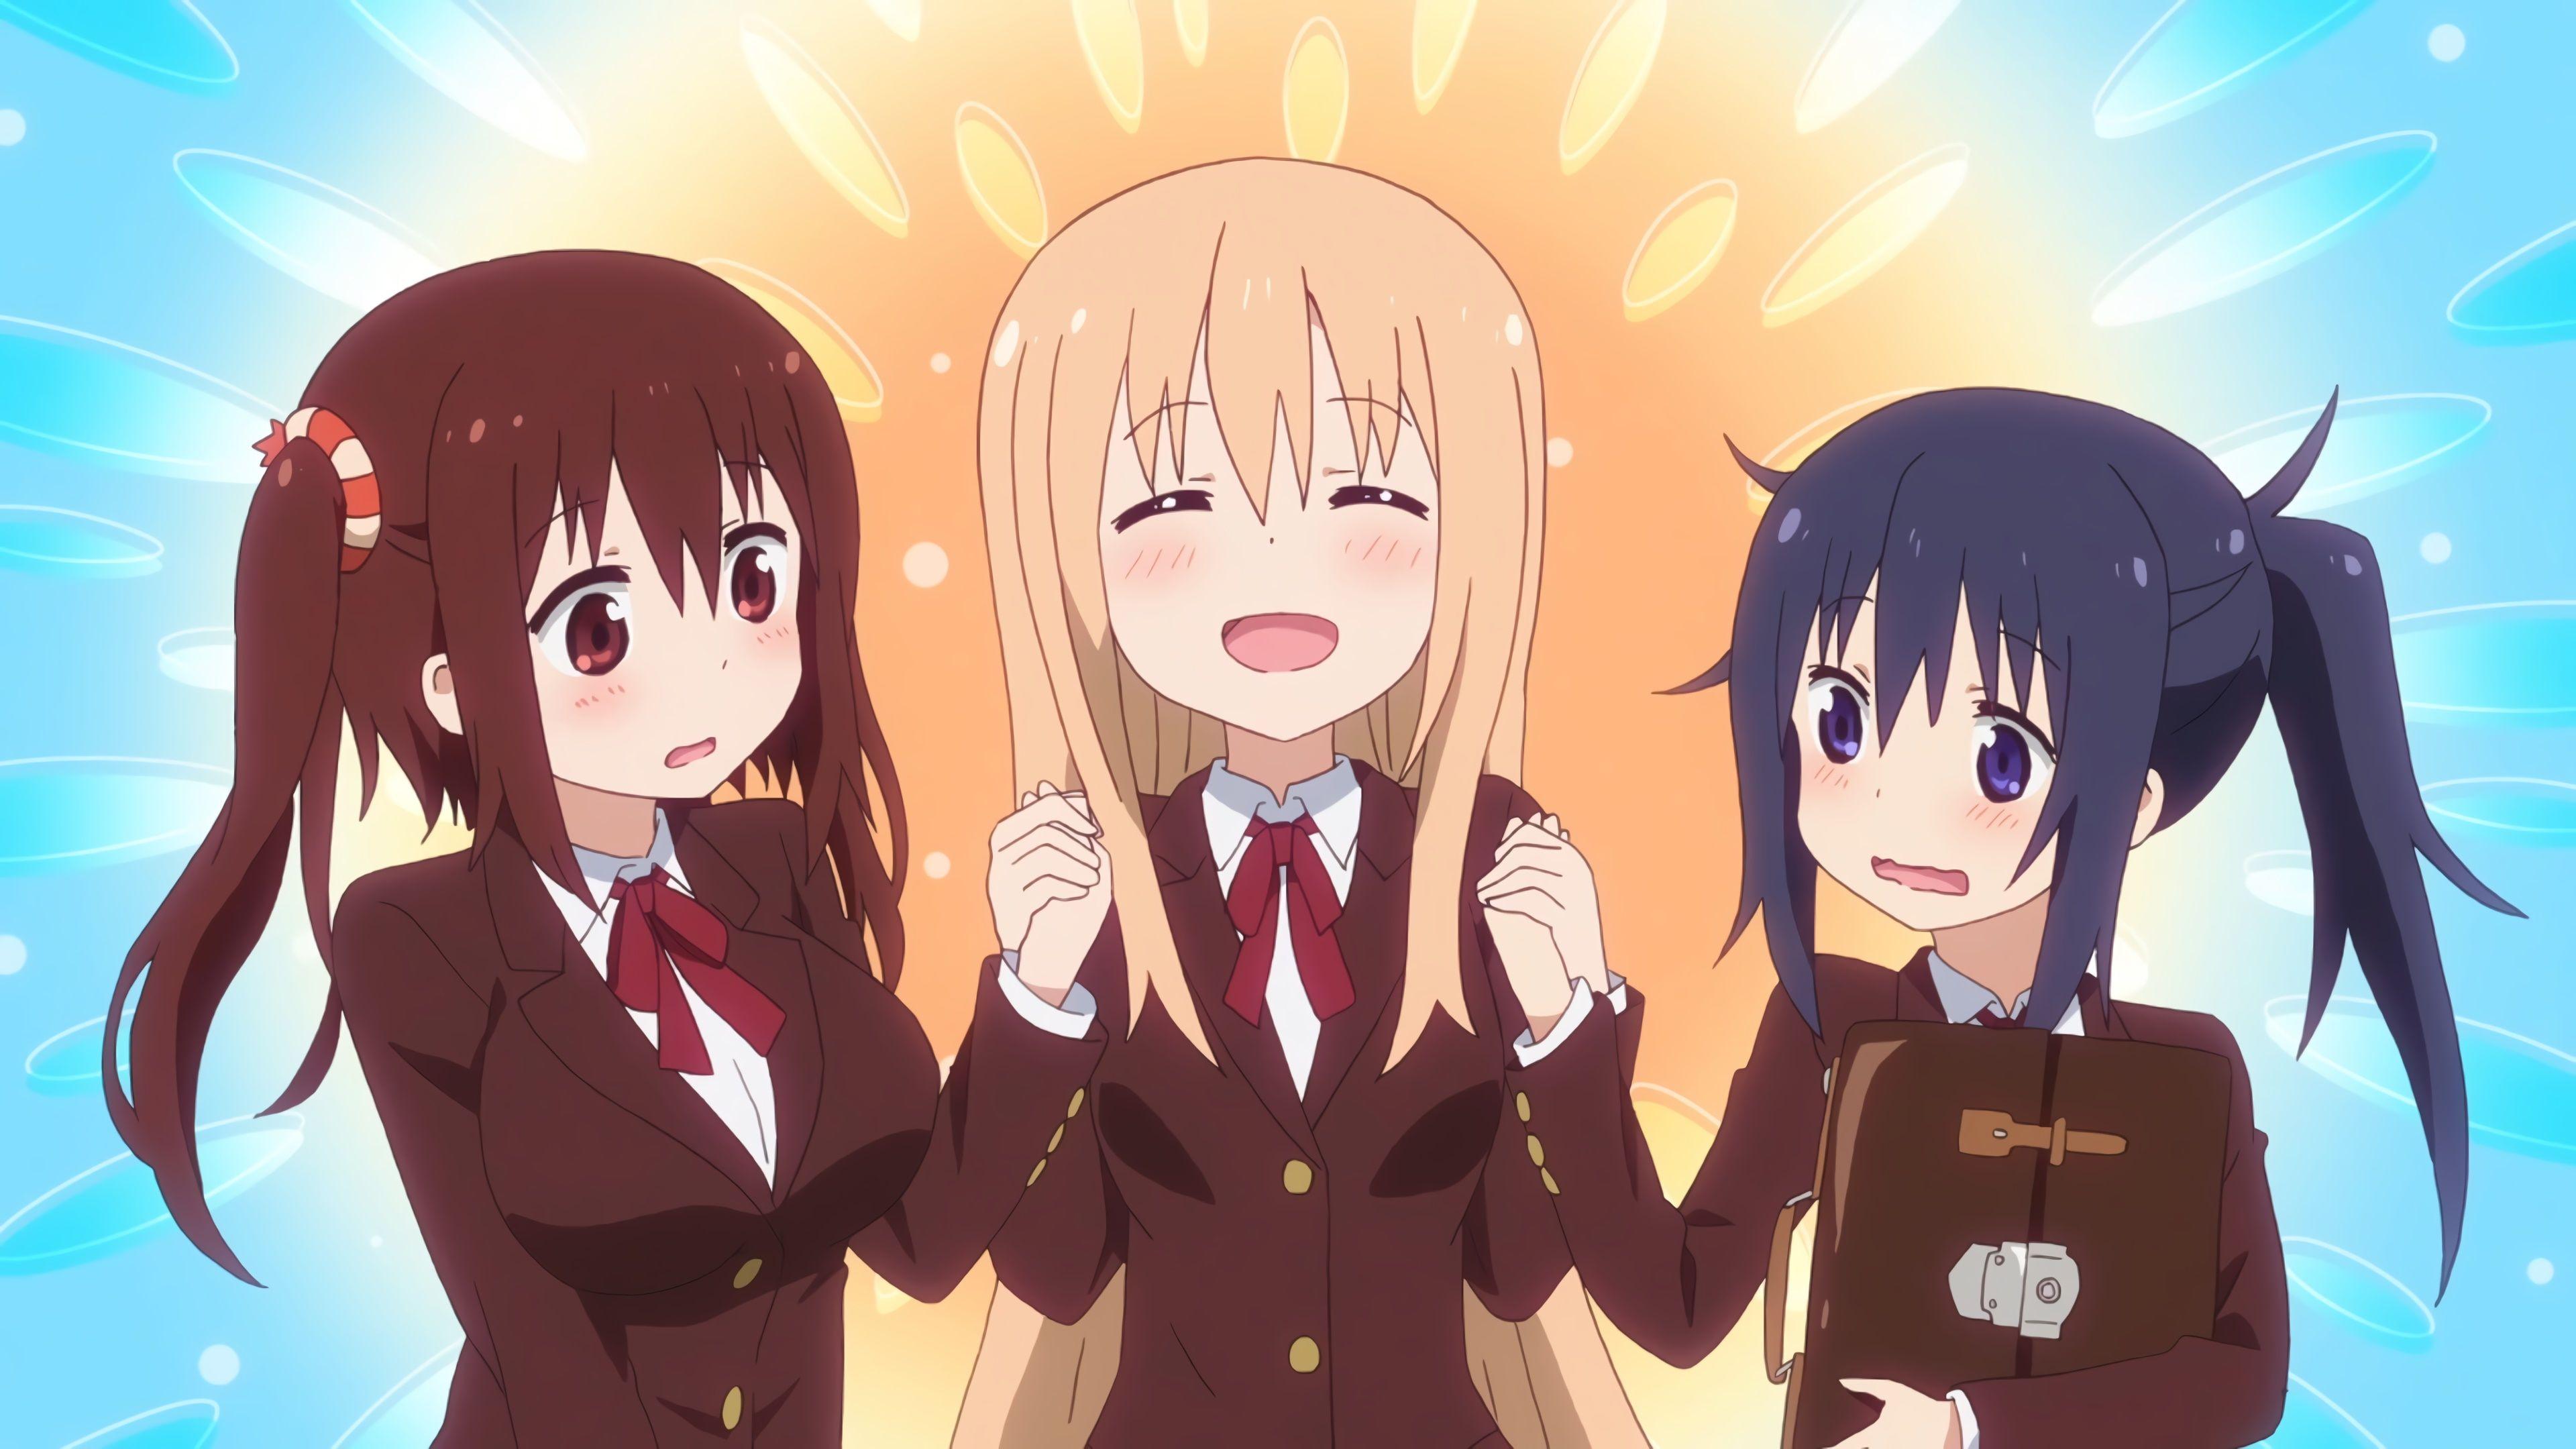 Pin by AnimMangFond on ♡ ★o♡ ★♡★ o♡★ o♡★ ♡o ★♡ ★ Anime